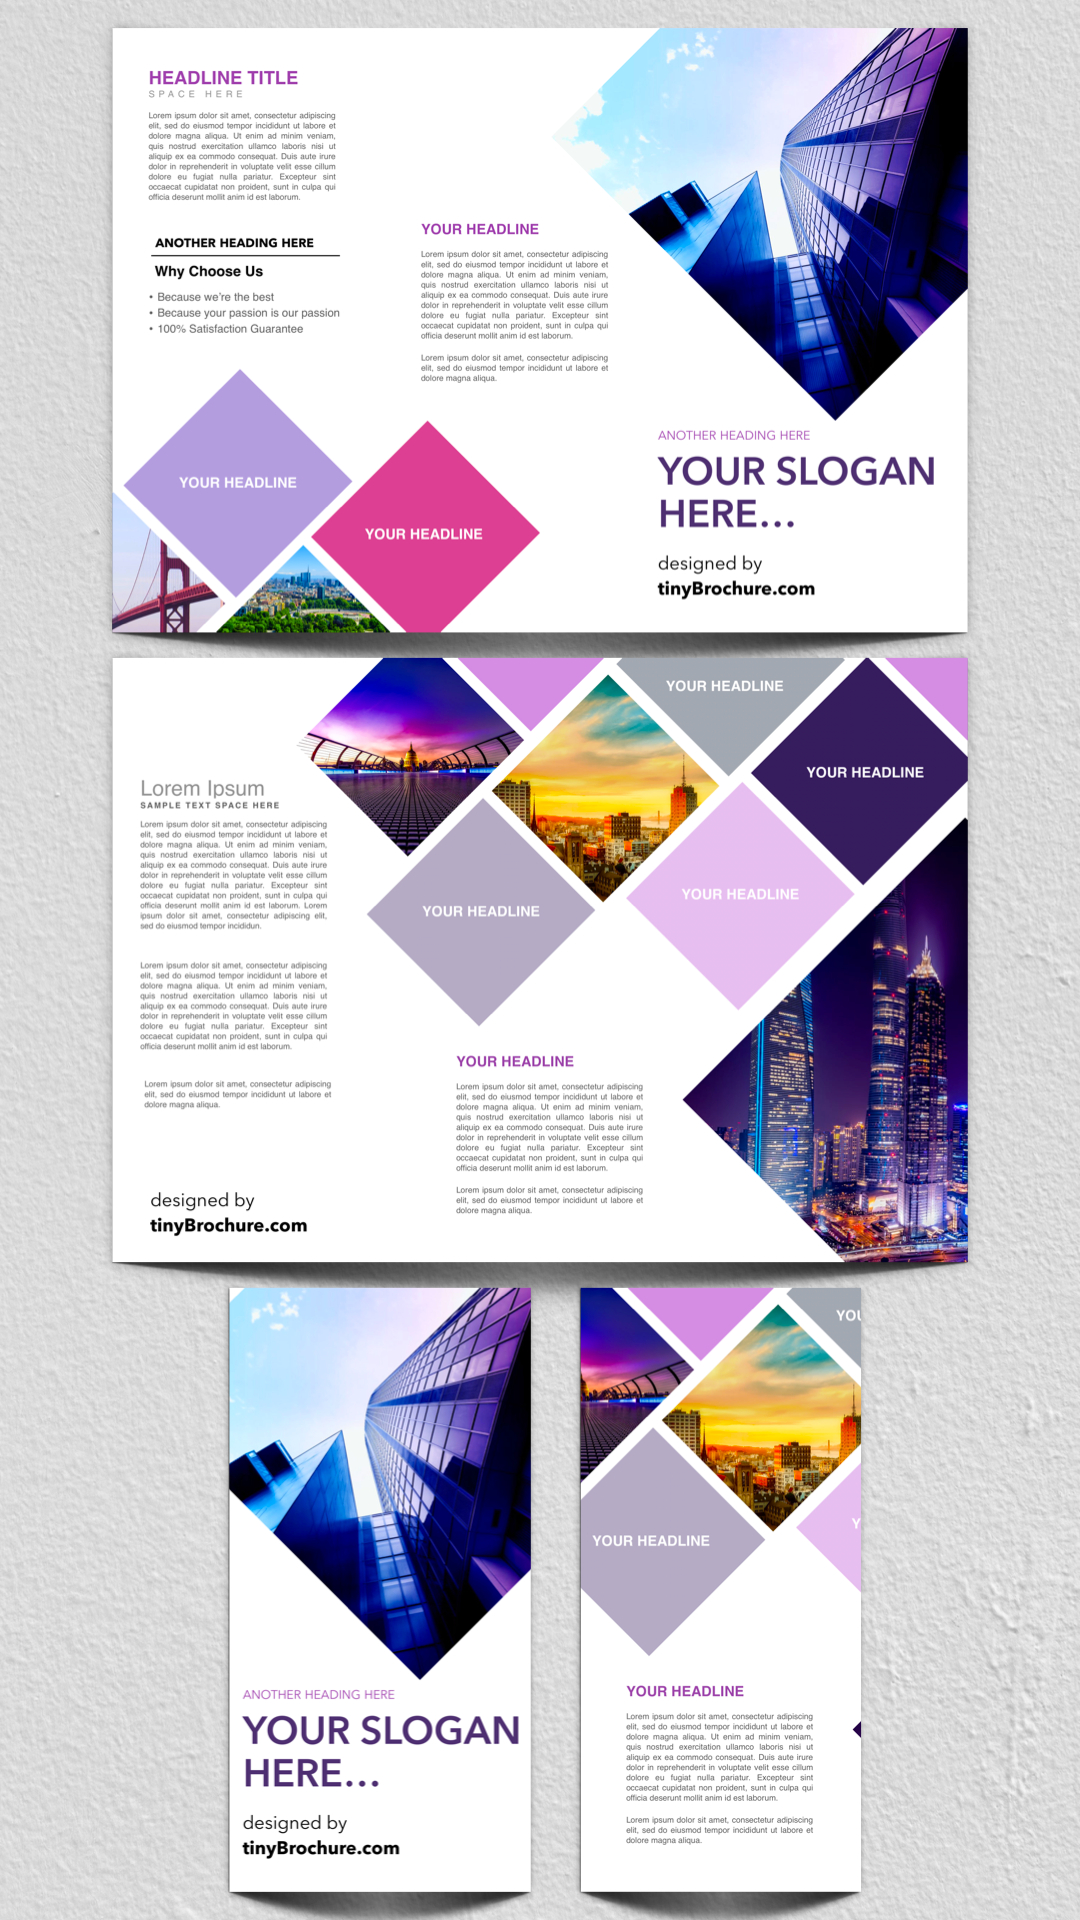 Panel Brochure Template Google Docs Free  Editorial Design Intended For Travel Brochure Template Google Docs